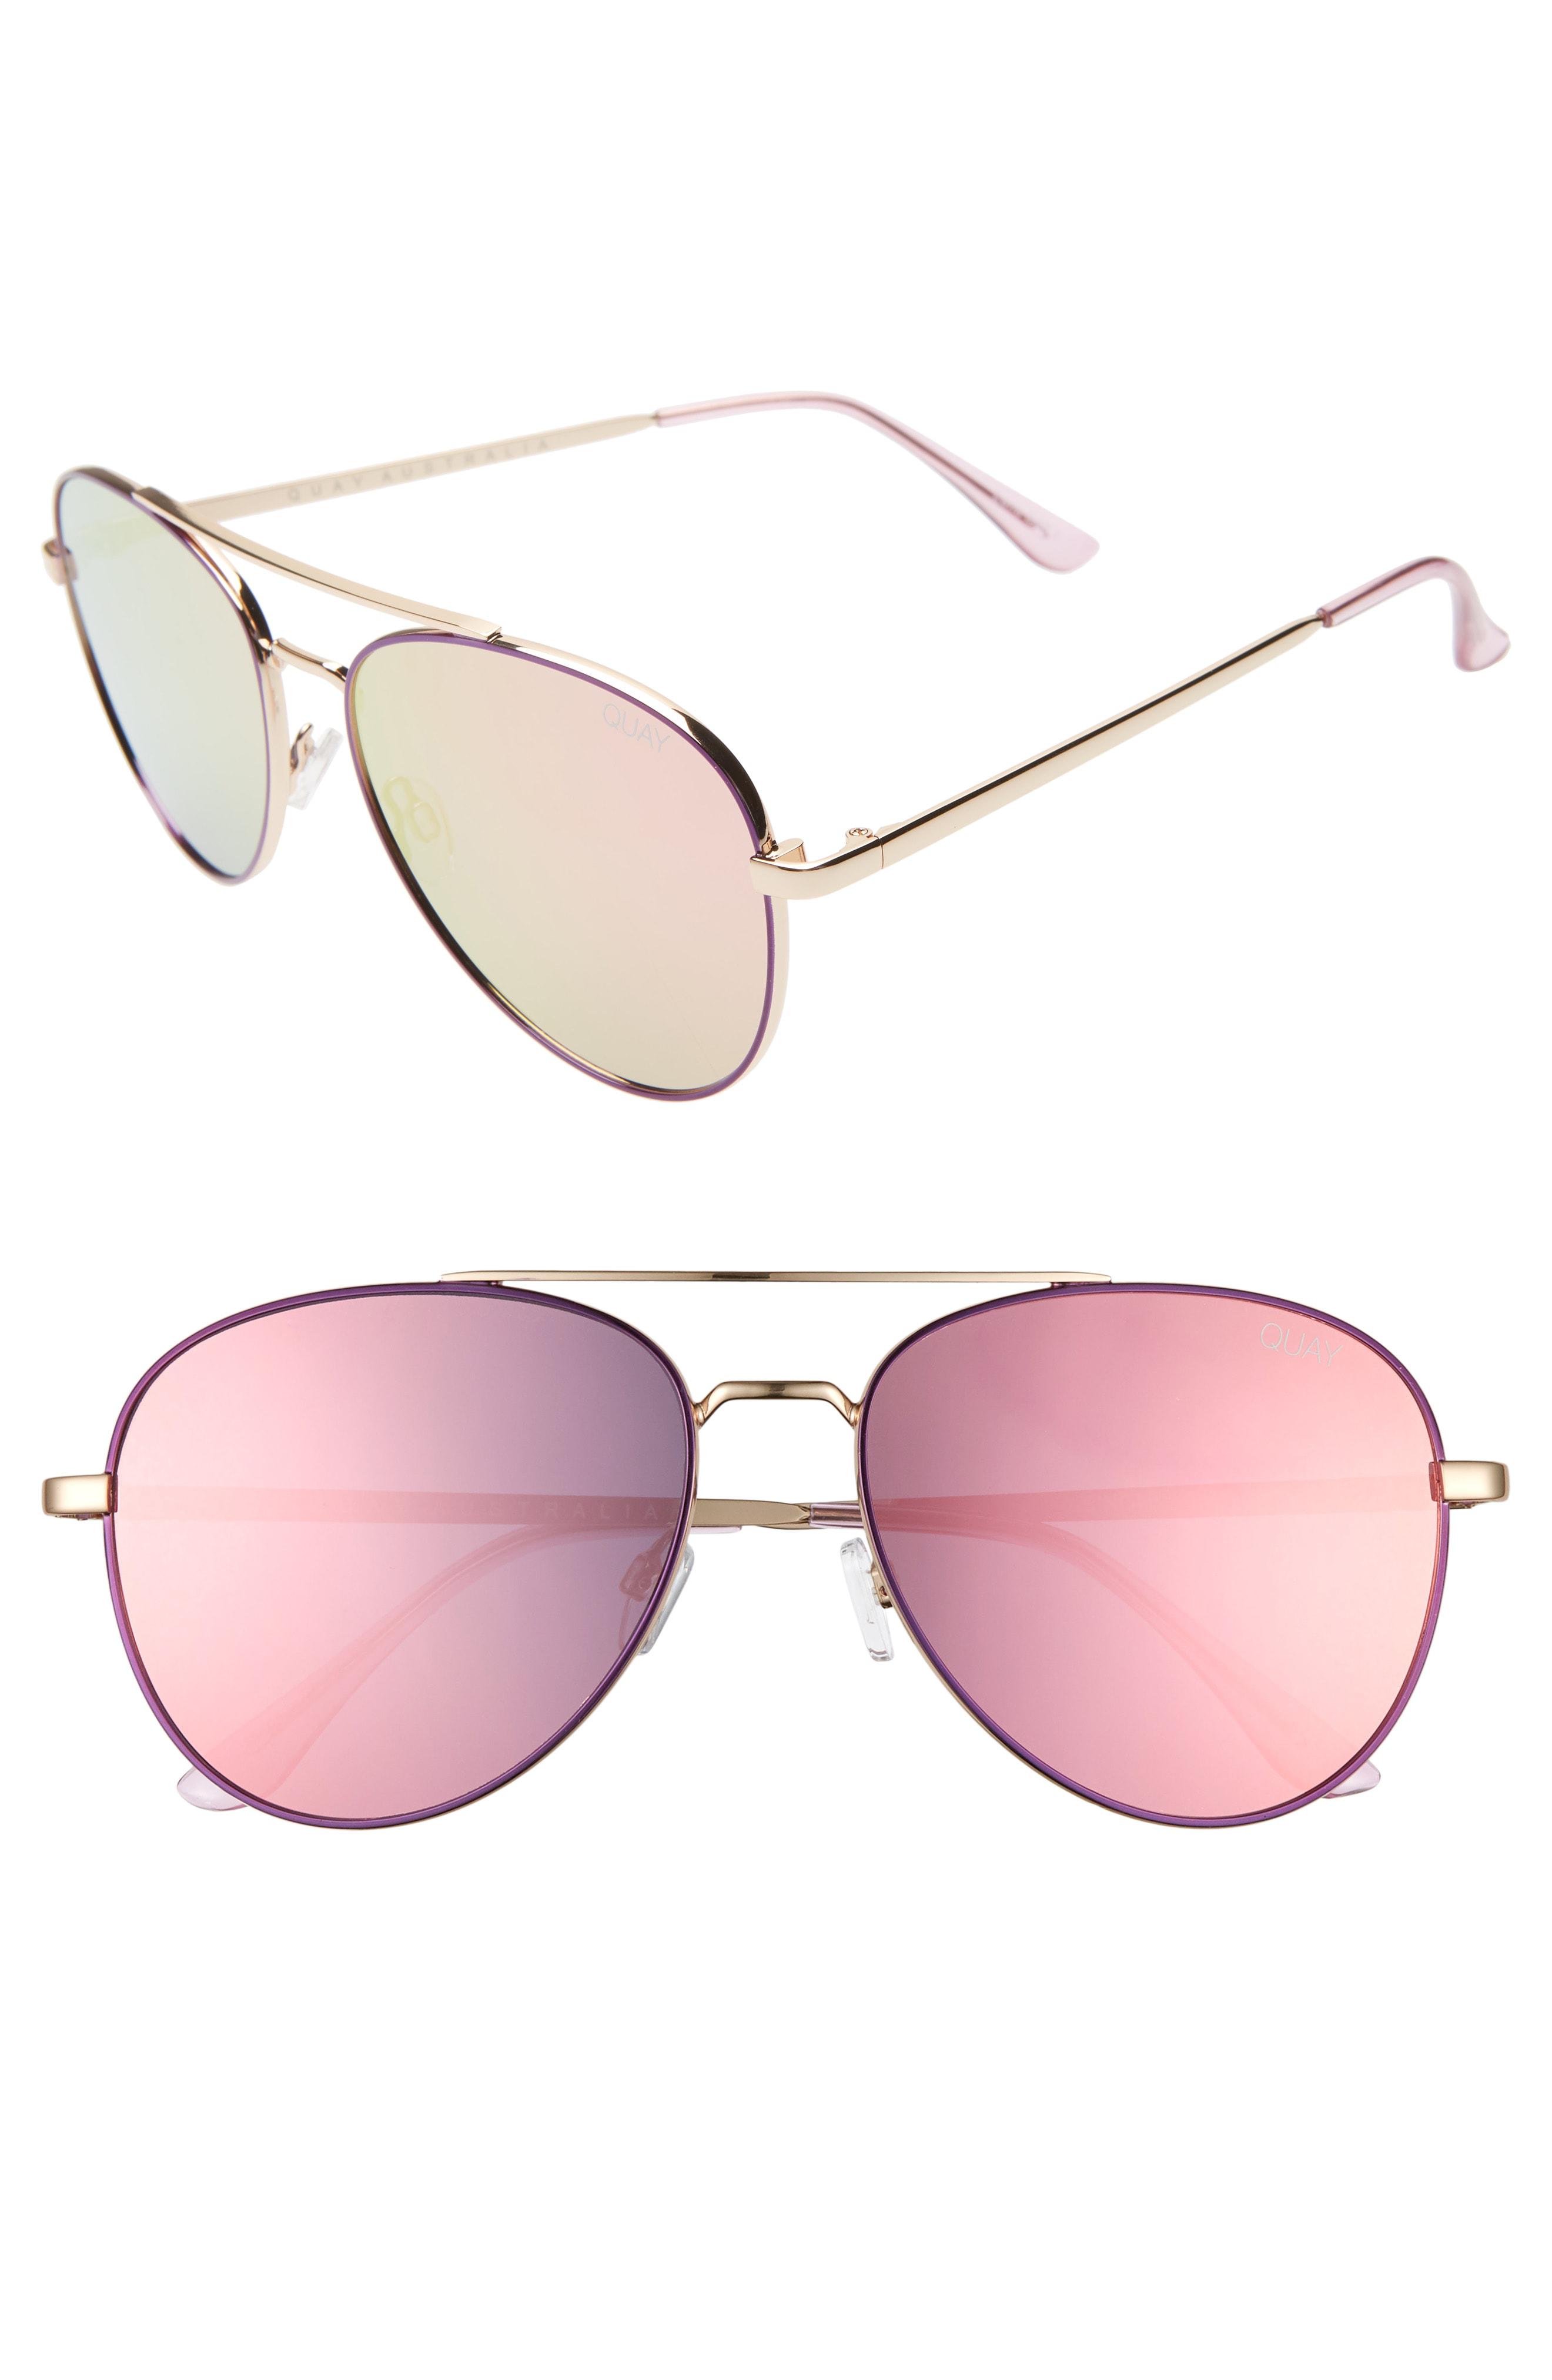 a1022e667dfe6 Quay Single 50Mm Aviator Sunglasses - Purple  Light Pink